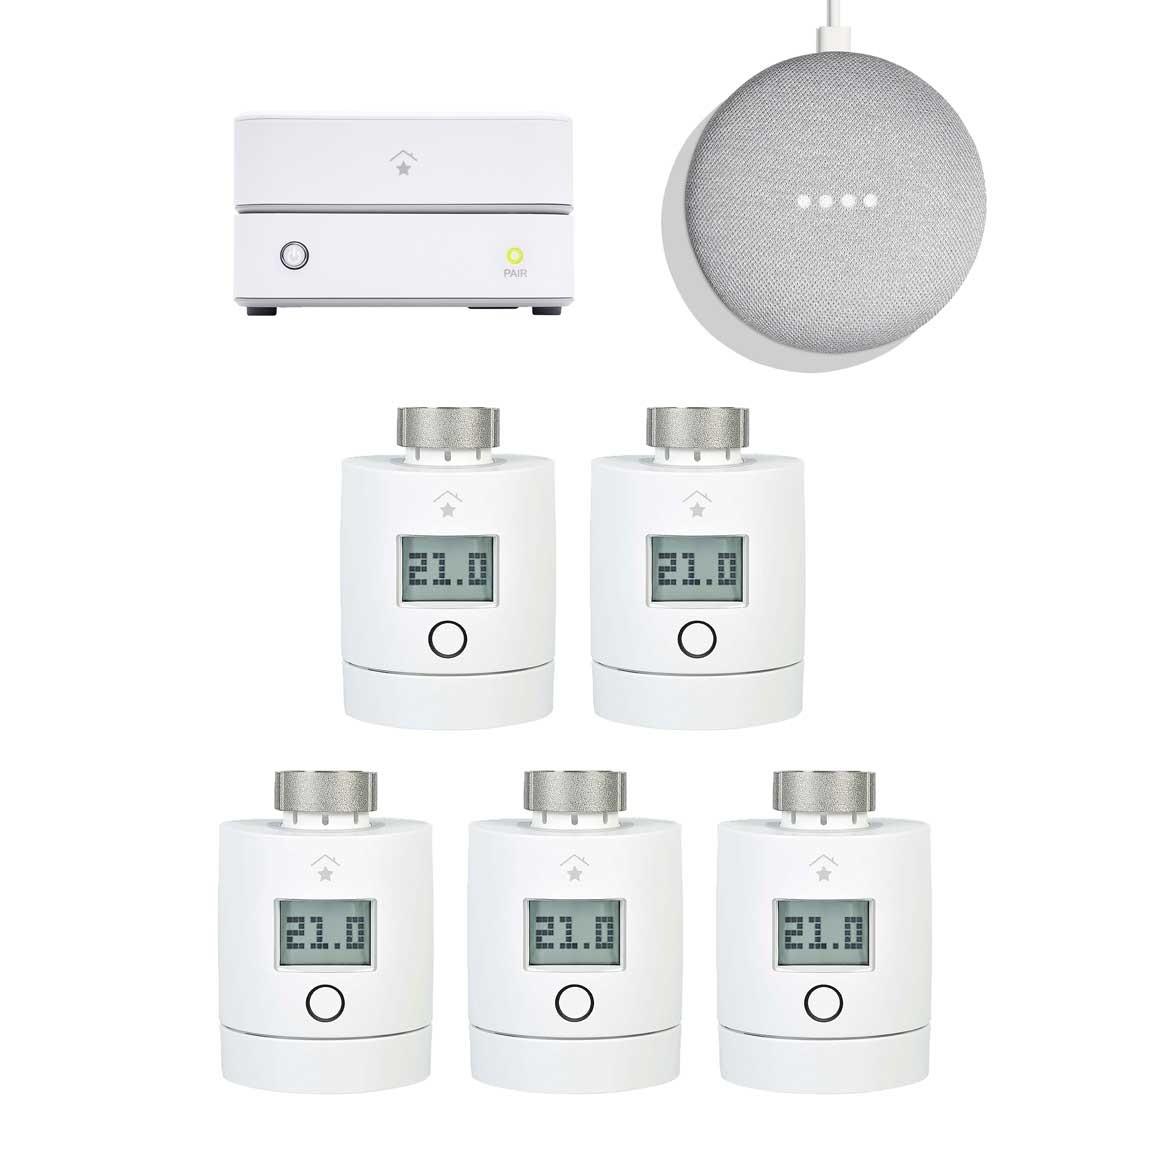 innogy SmartHome Starter Set Heizung mit 5 Thermostaten + gratis Google Home Mini